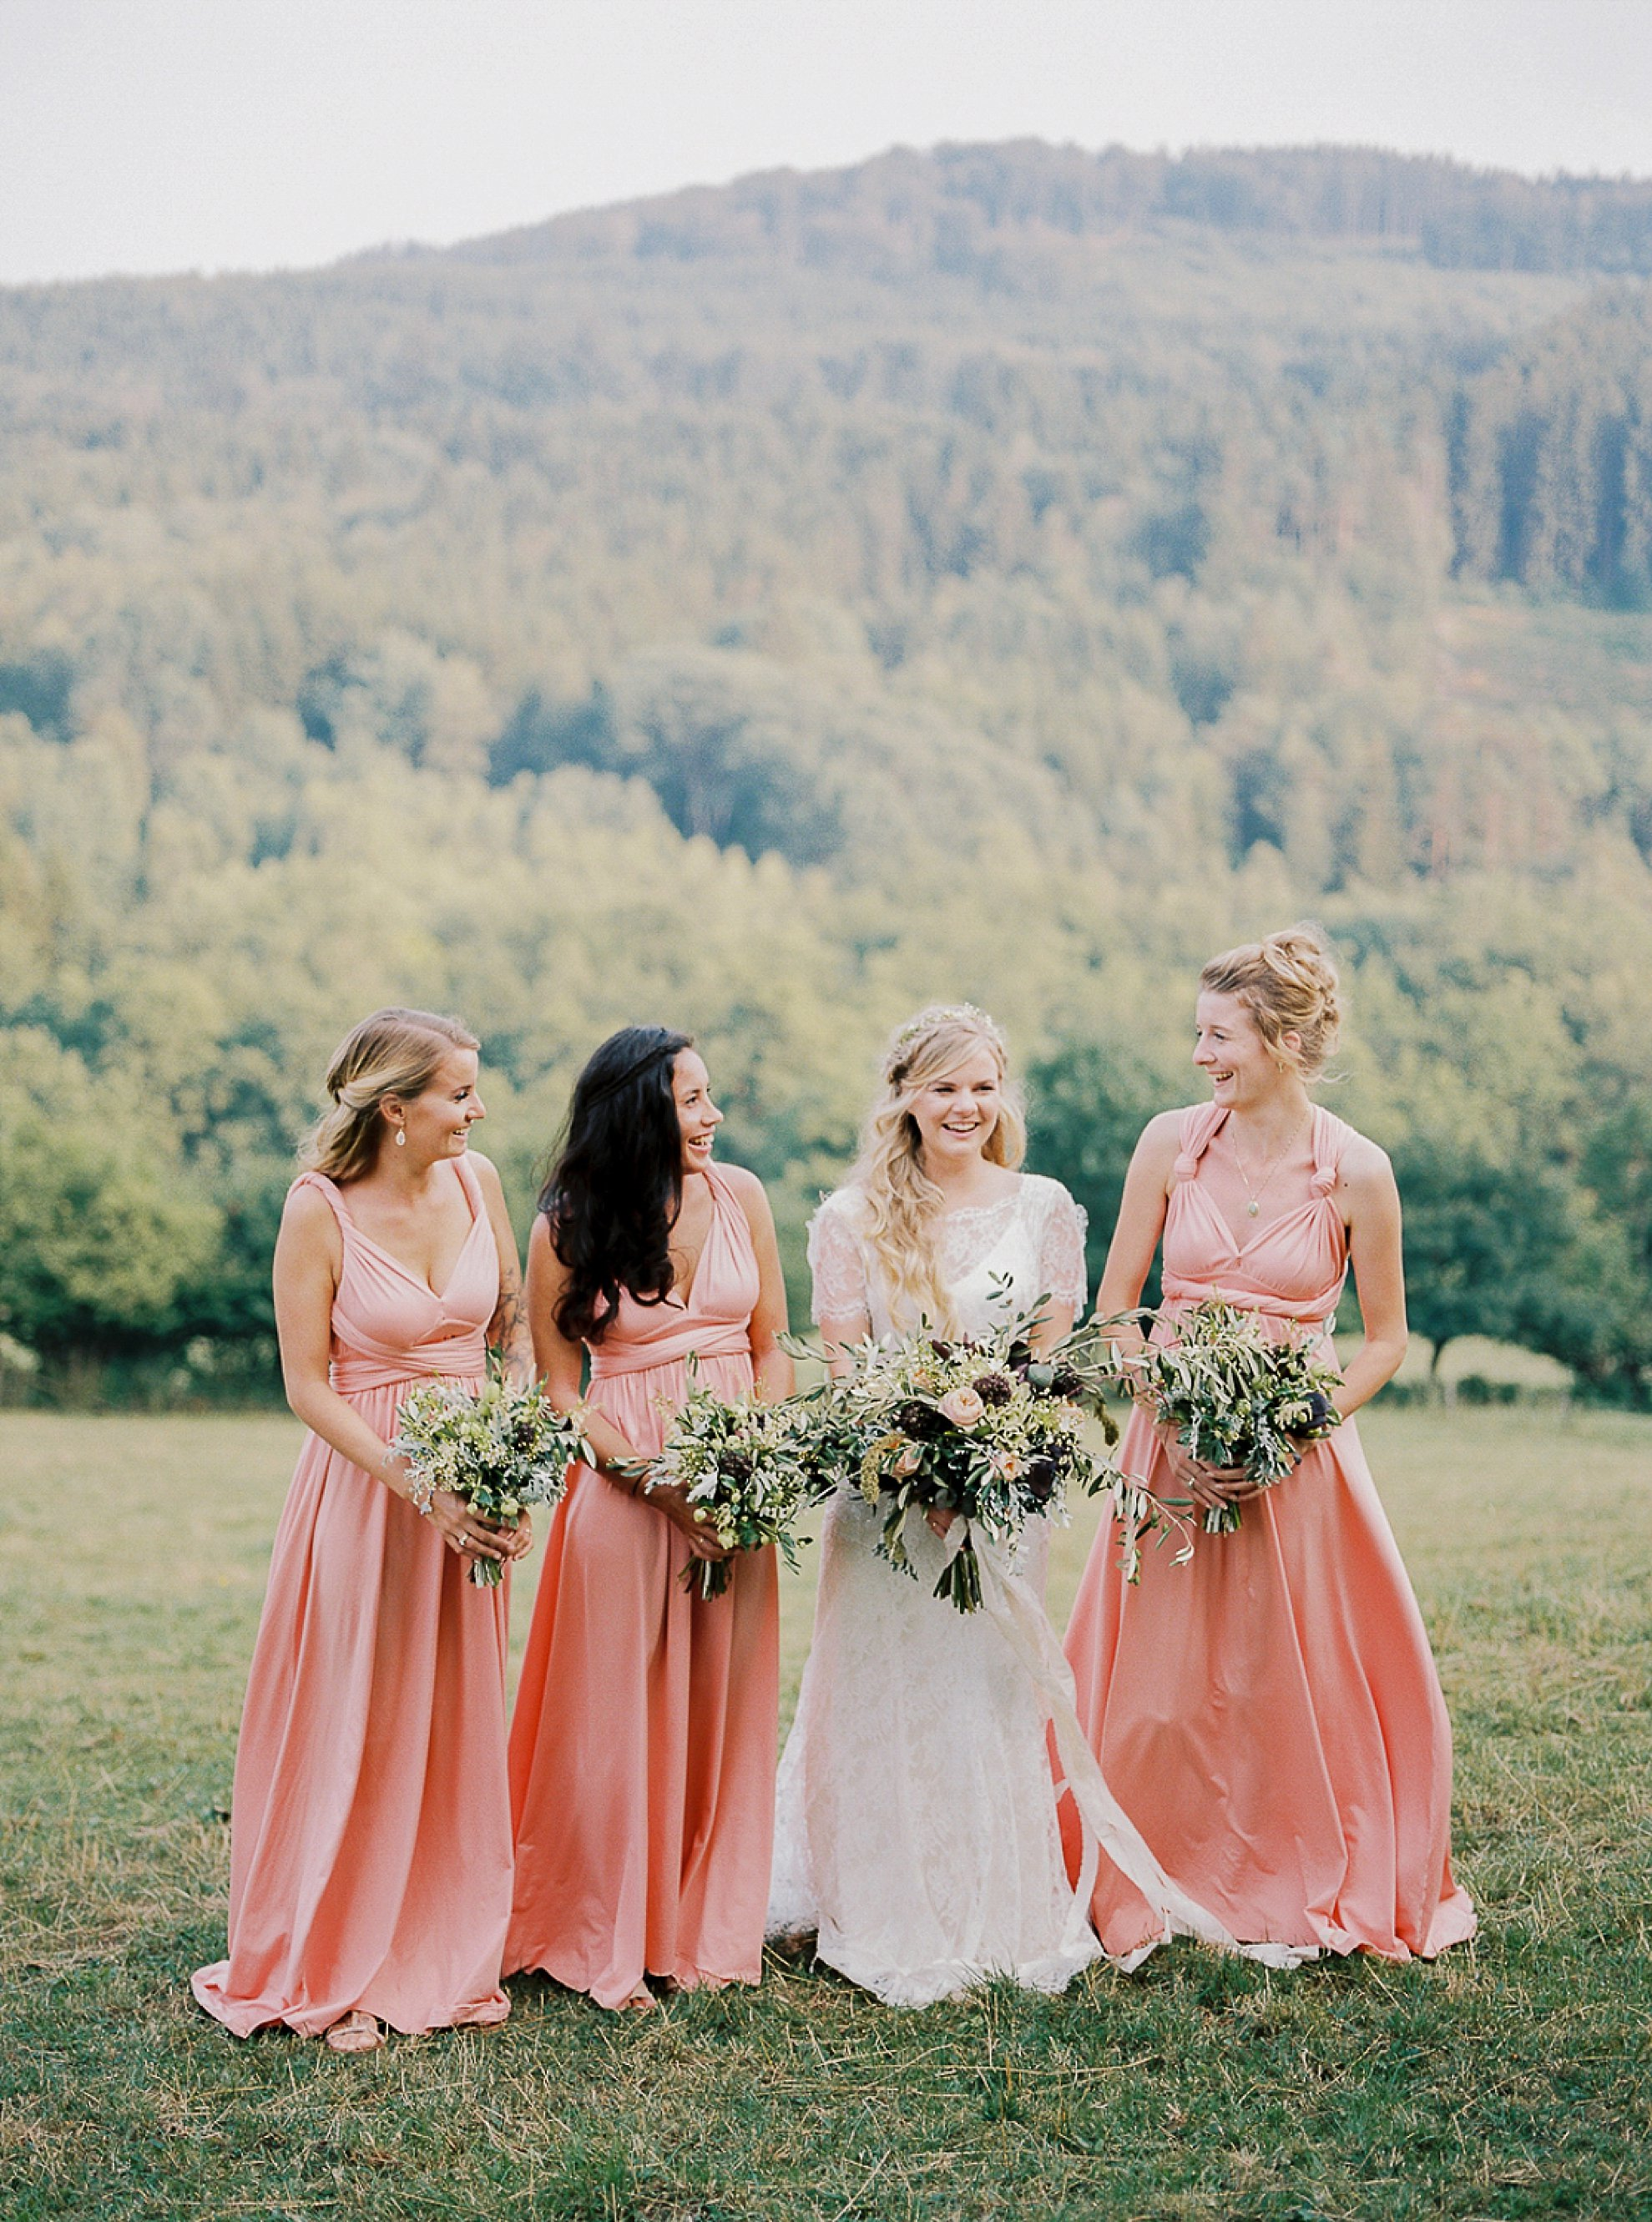 Amanda-Drost-Fotografie-Belgie-Photography-Wedding_0029.jpg